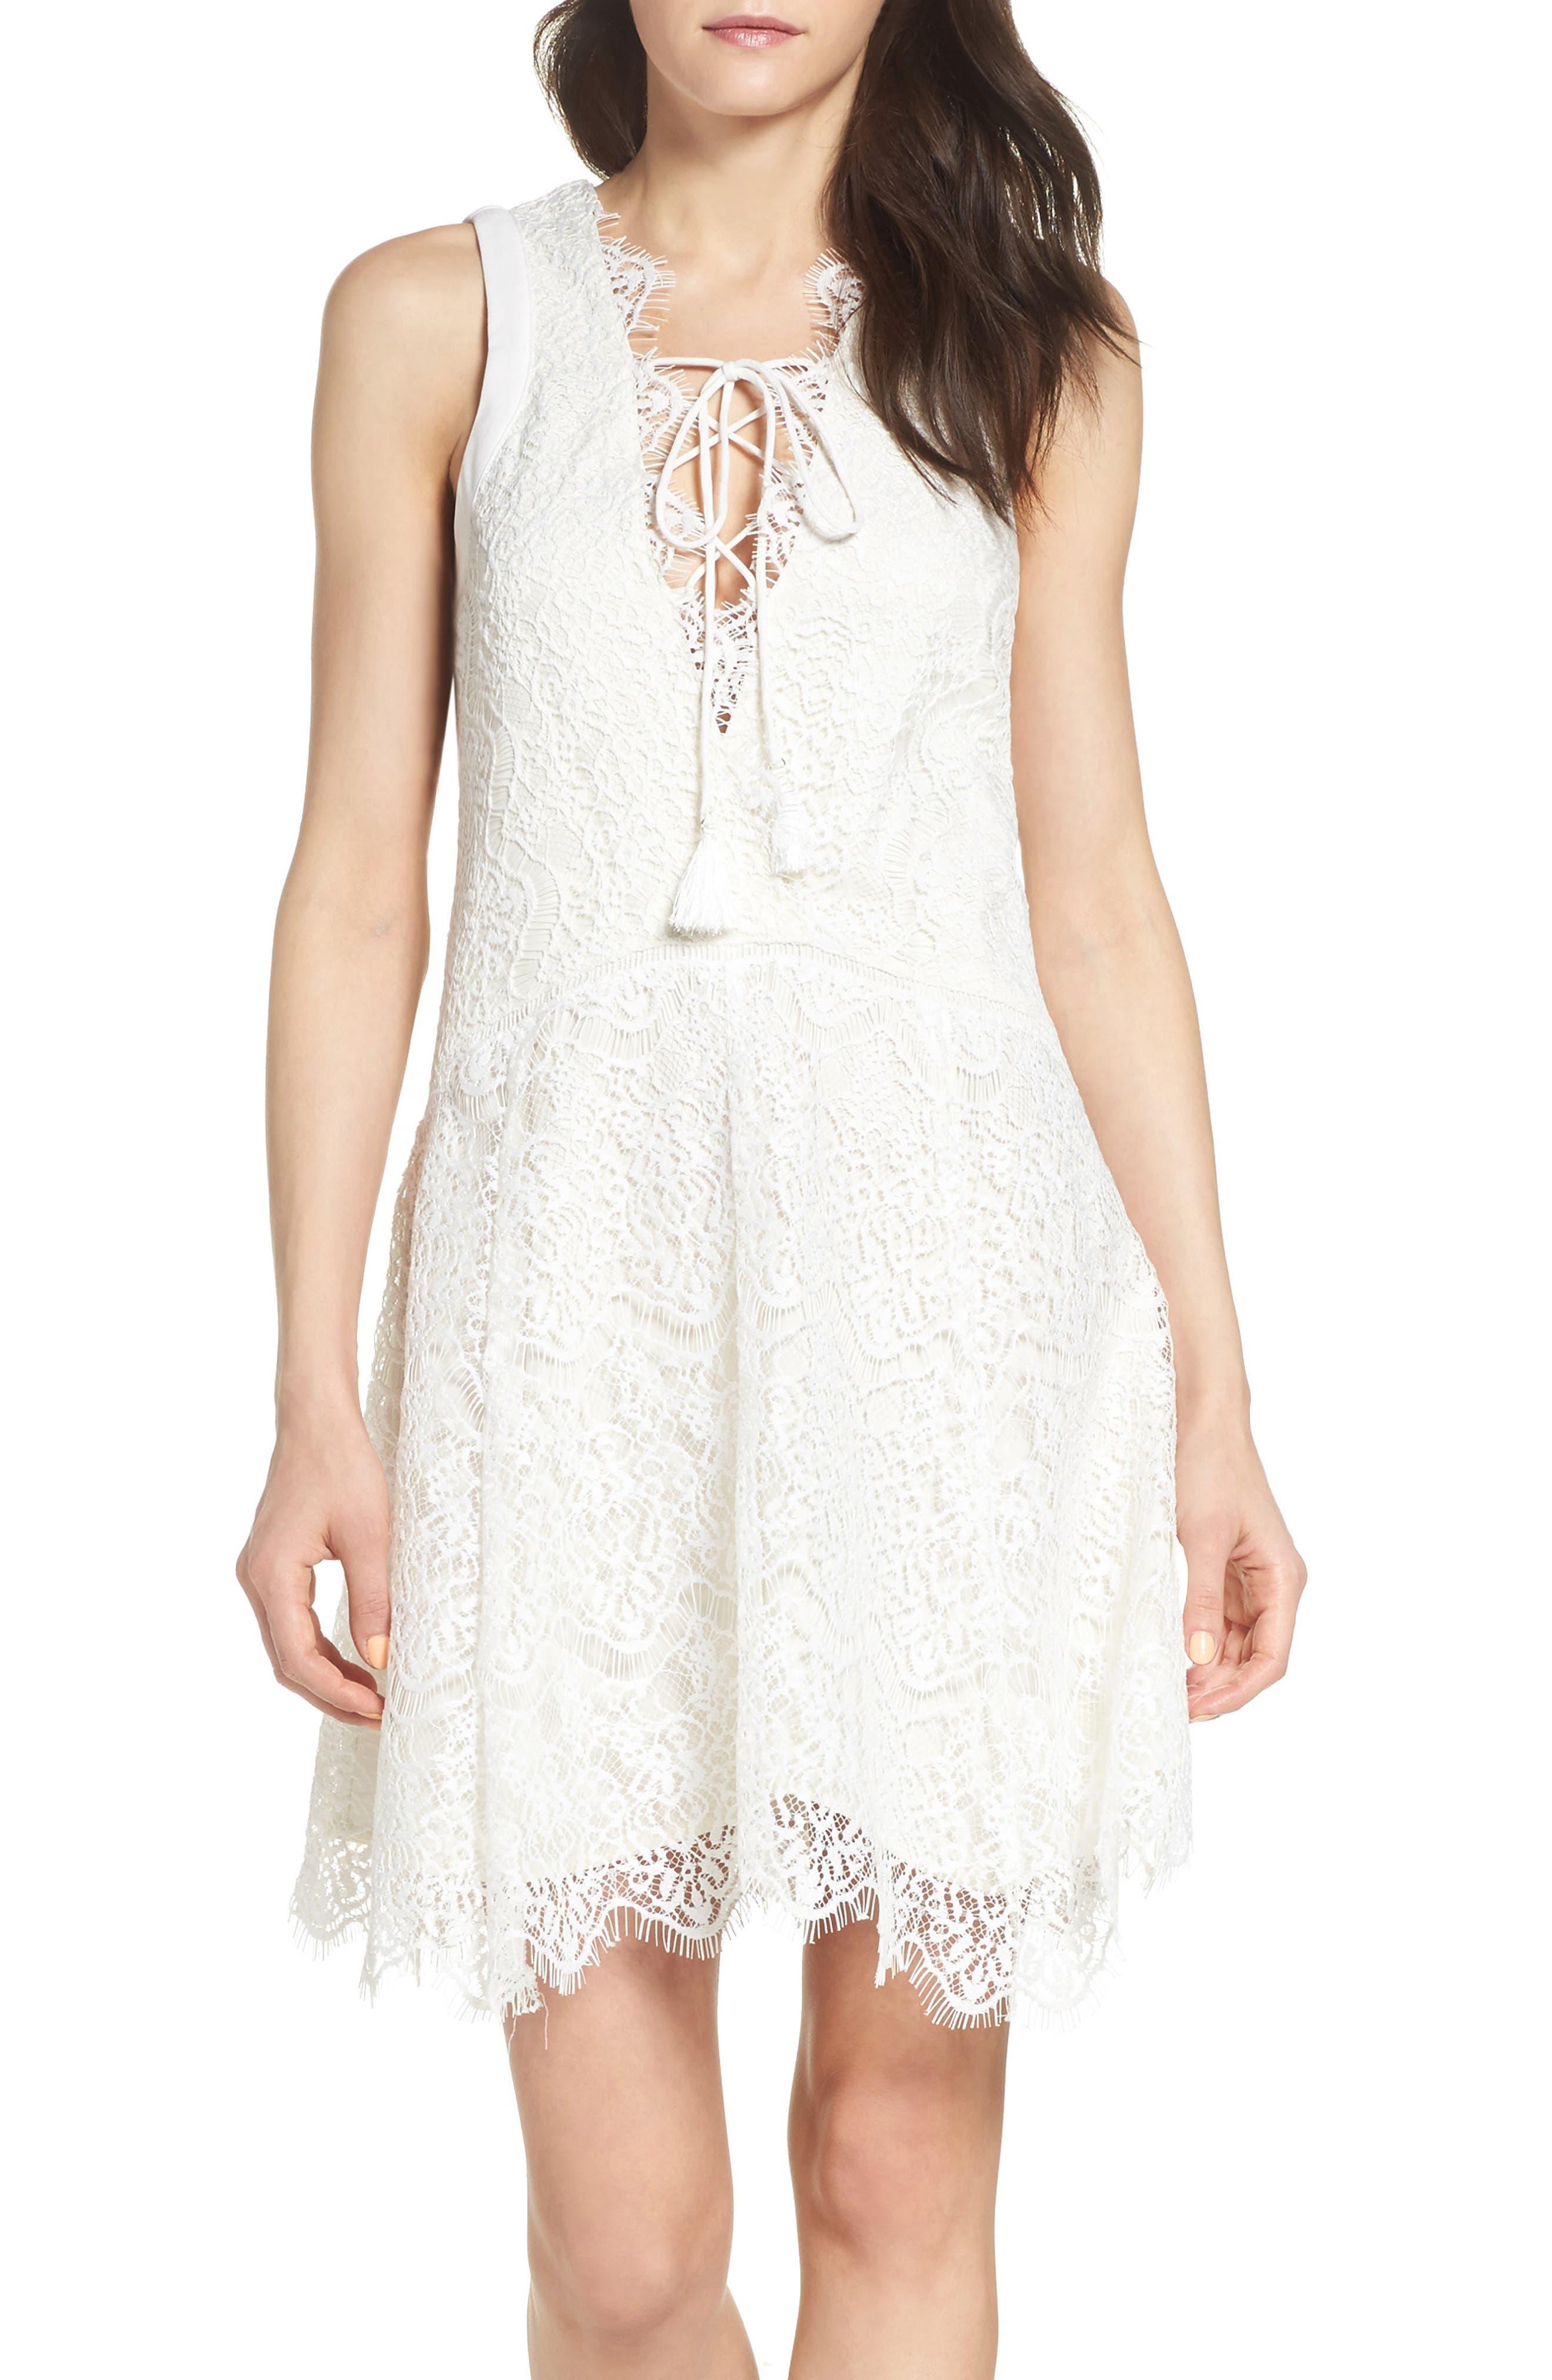 Alternate Image 1 Selected - Adelyn Rae Lace Shift Dress